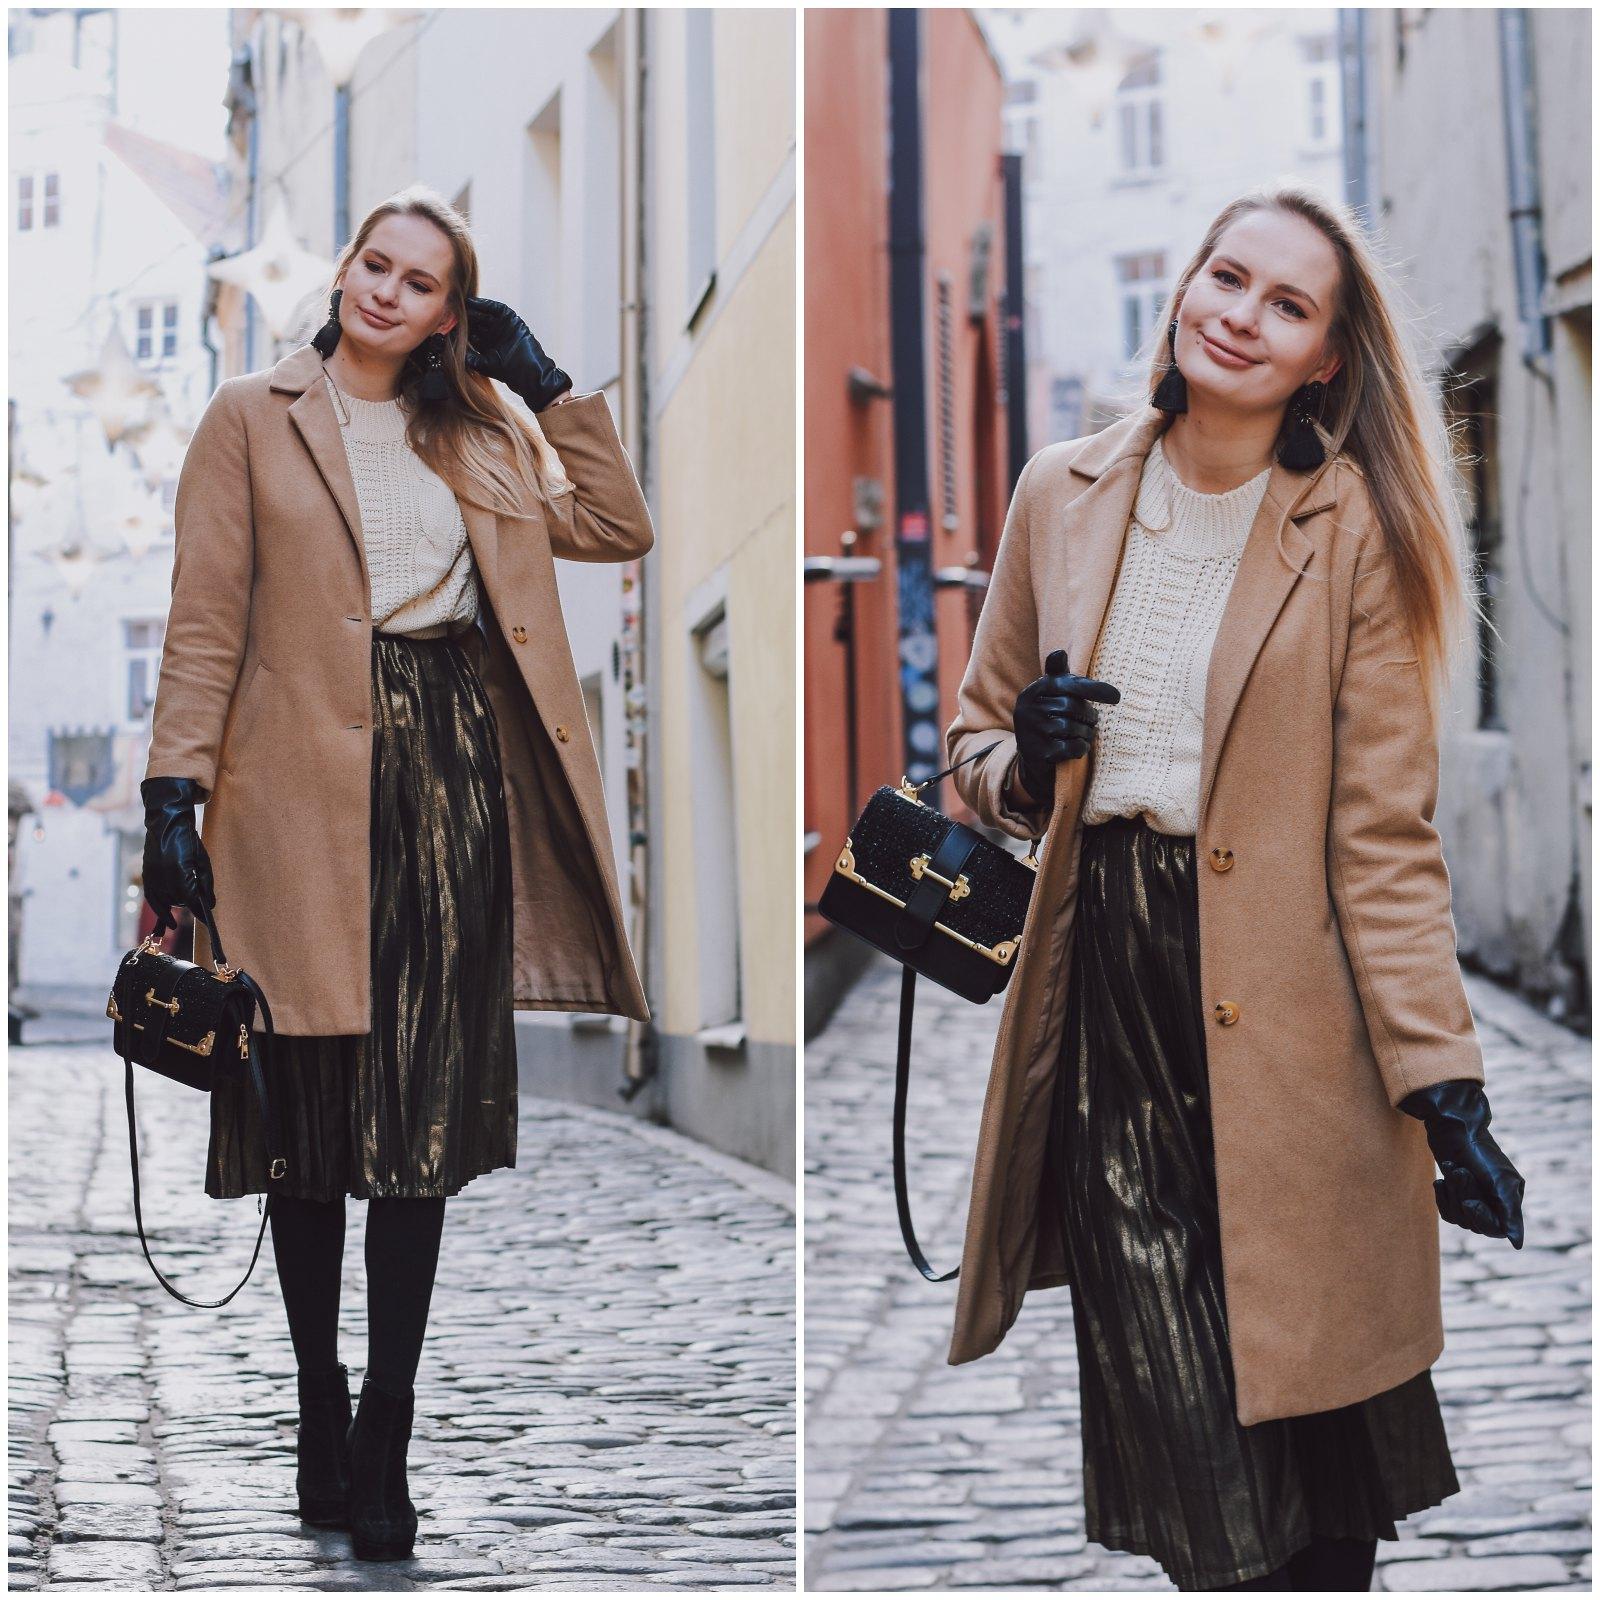 European street style